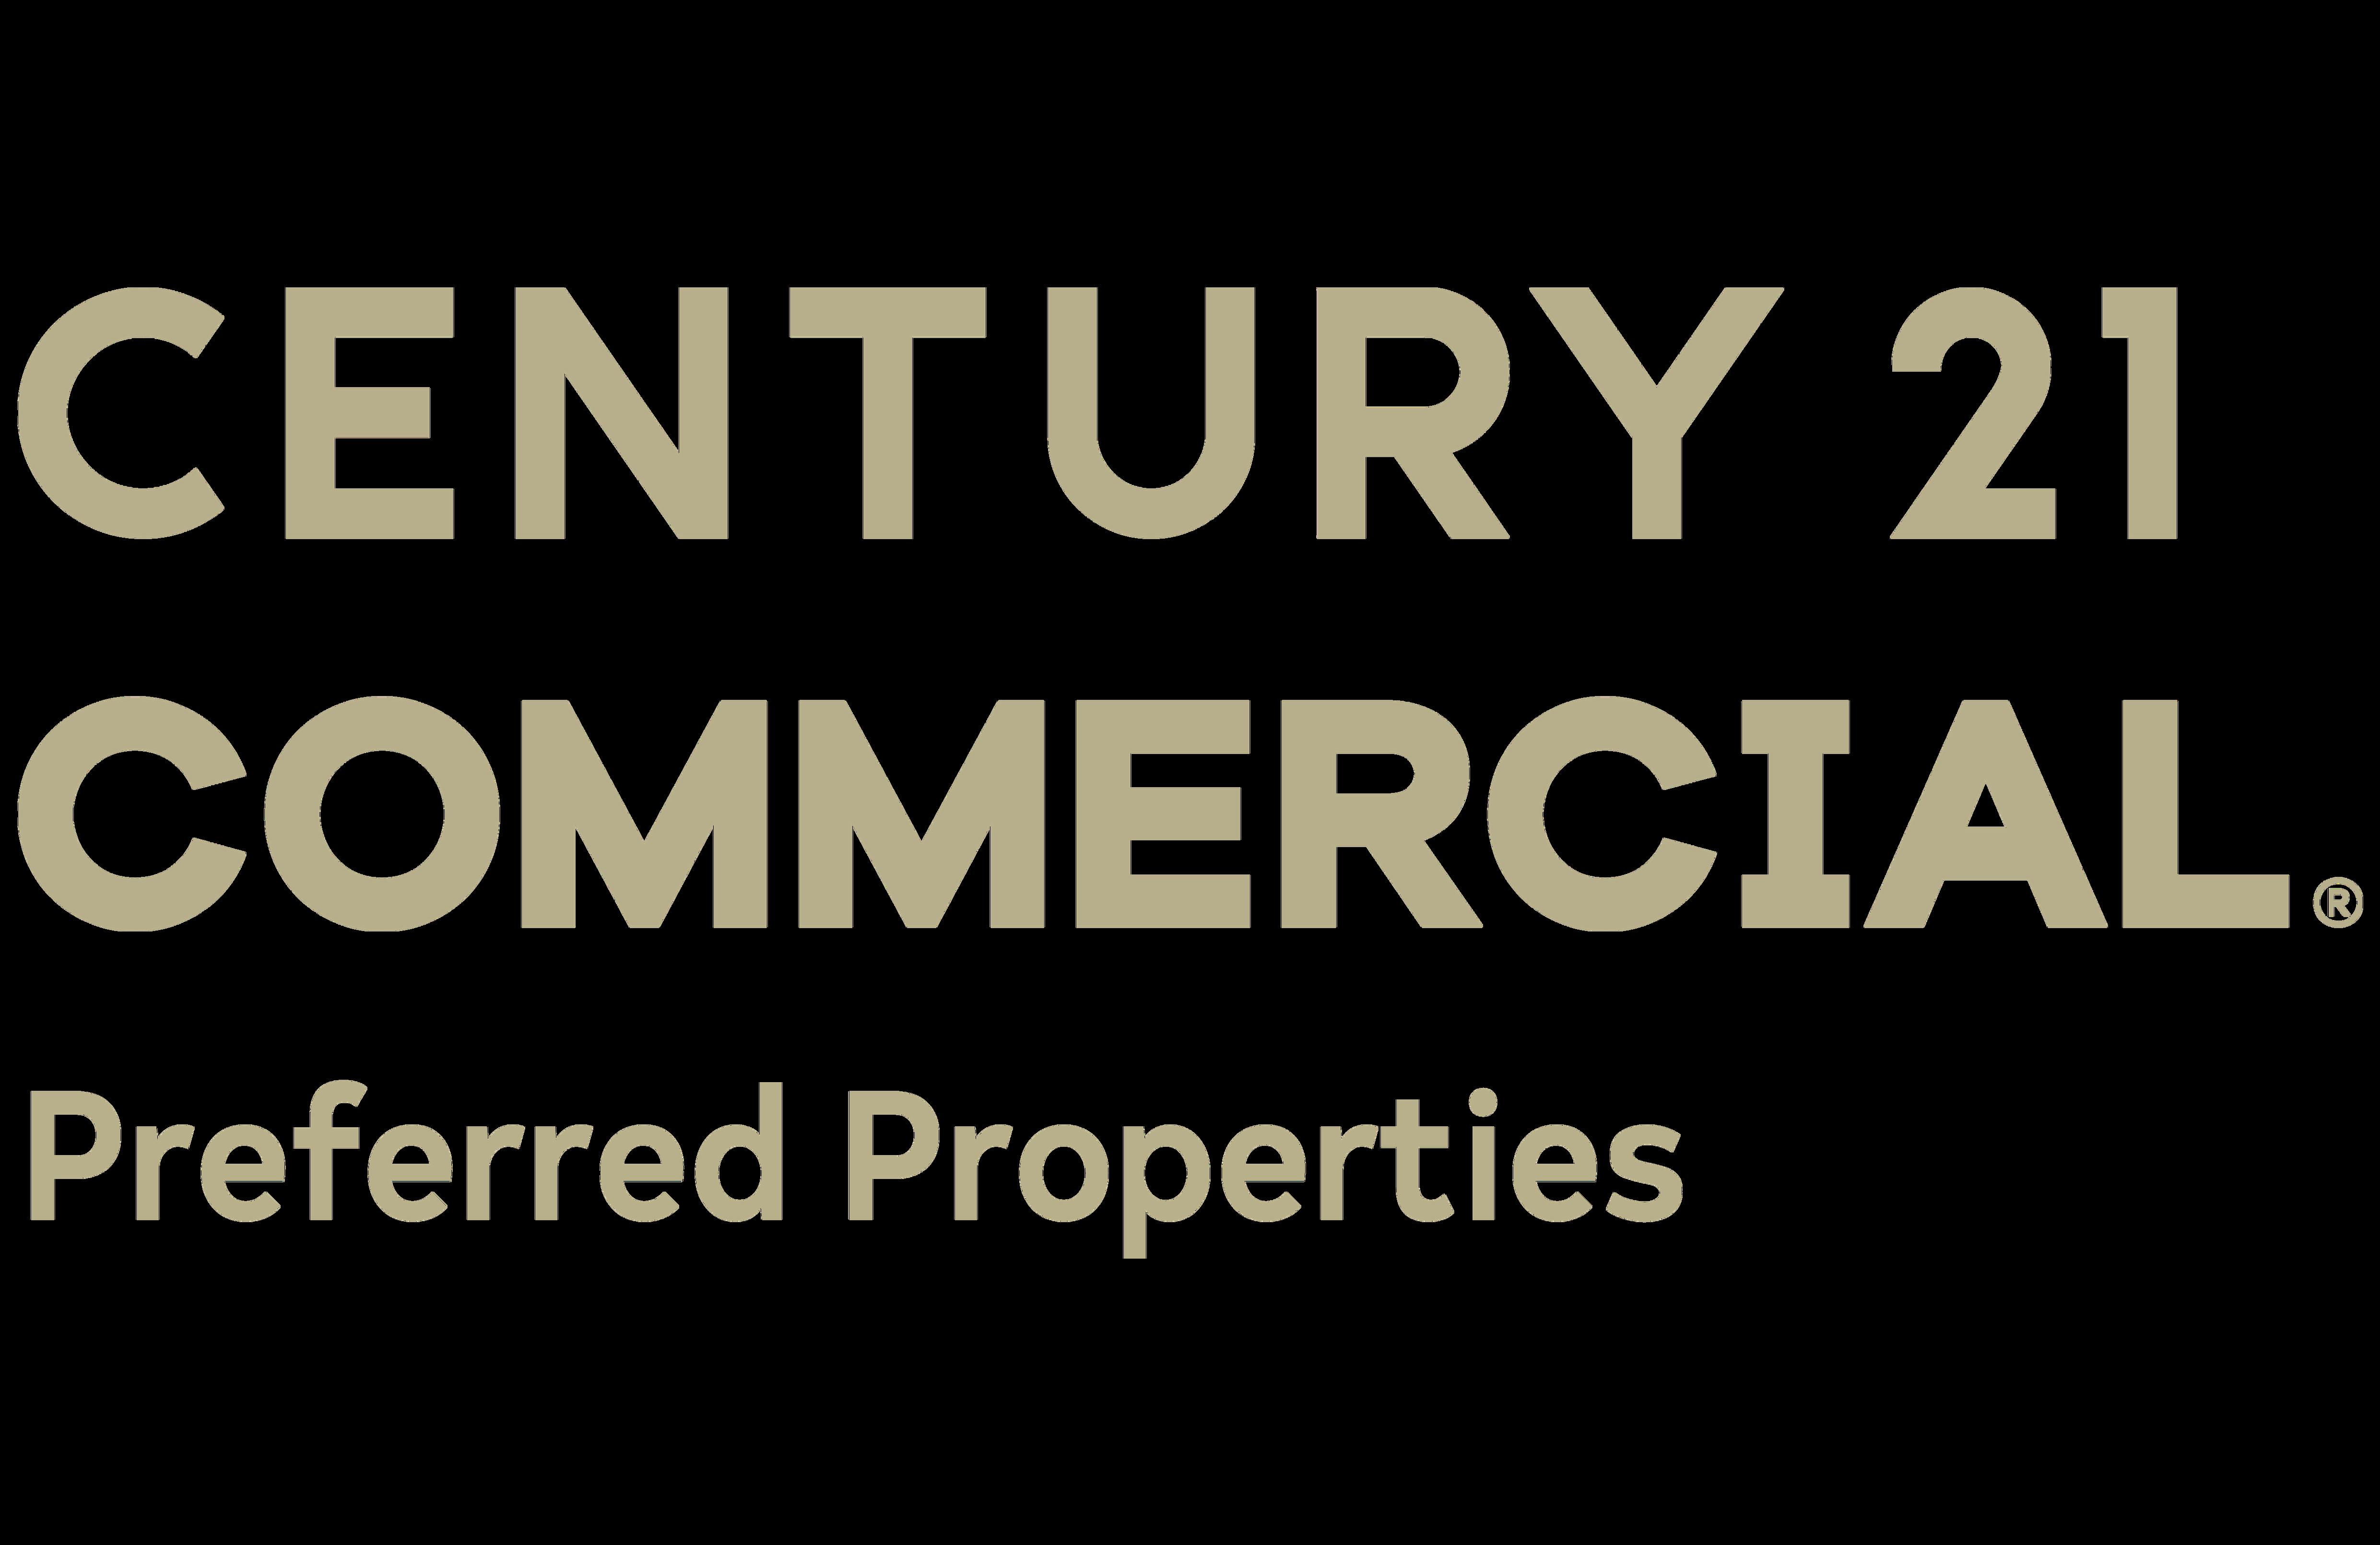 CENTURY 21 Preferred Properties